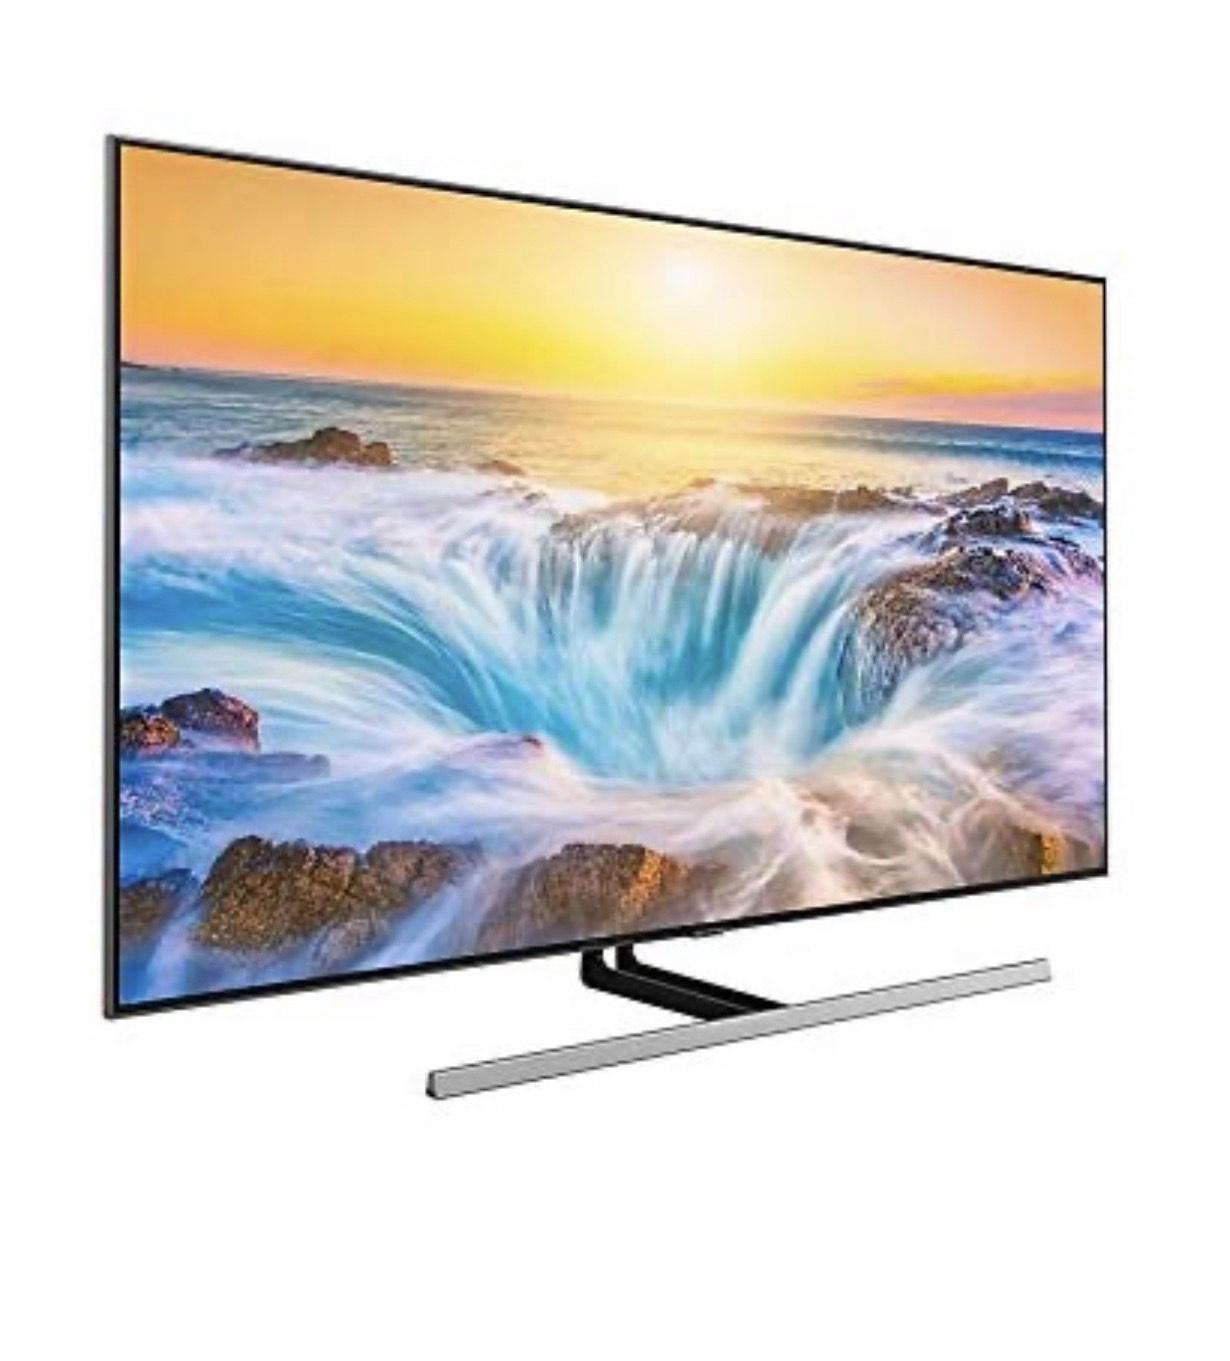 "TV QLED 65"" Samsung QE65Q85R - Full LED, 4K UHD, HDR 1500, Smart TV (Vendeur Tiers)"